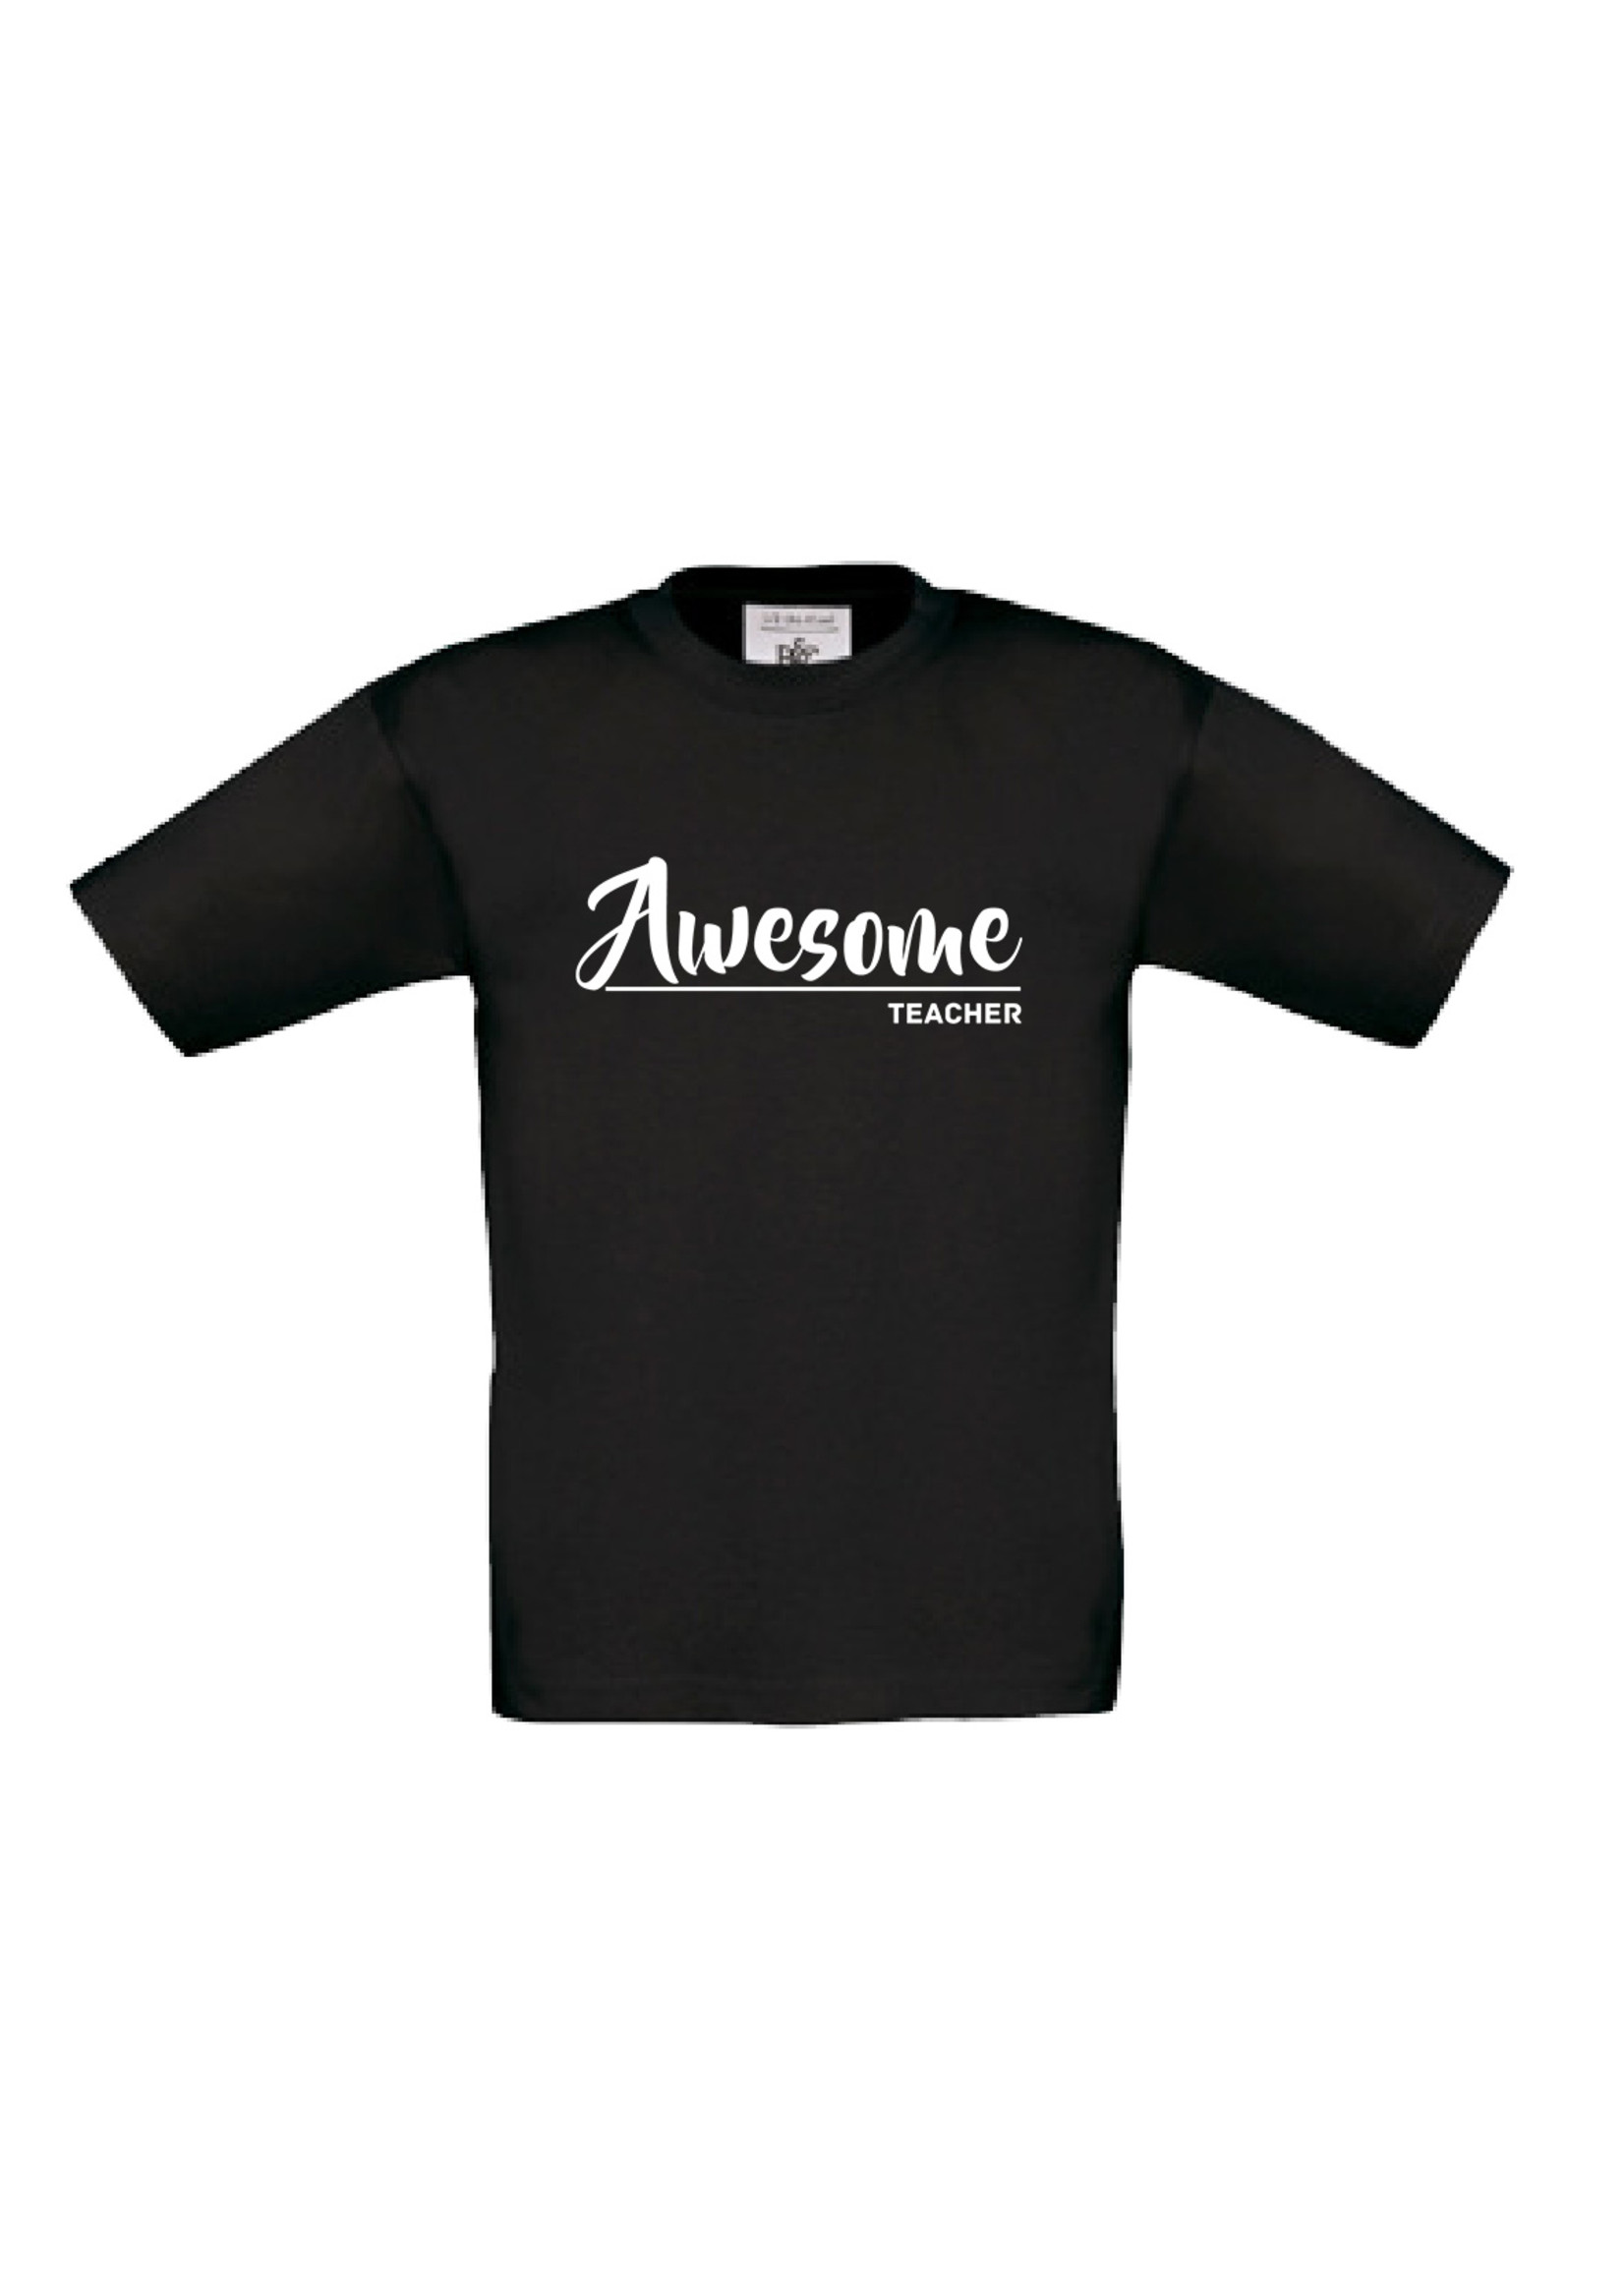 Awesome teacher shirt